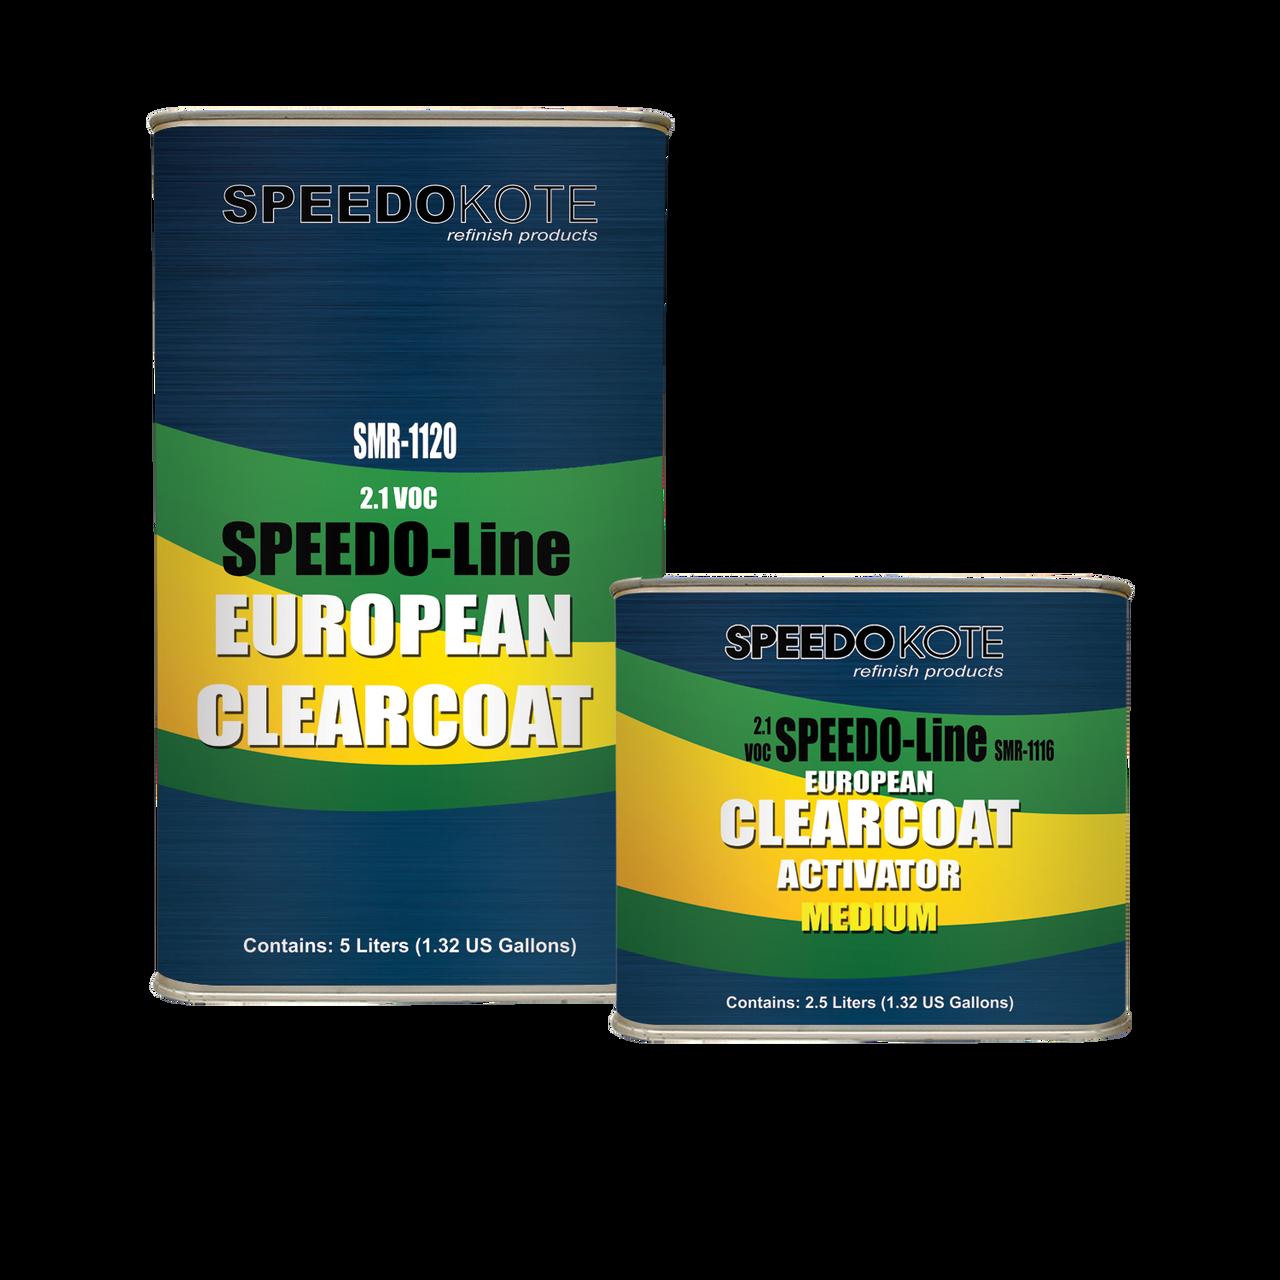 SMR-1120/1116, 2.1 VOC European Clear Coat 2K Urethane Medium Kit